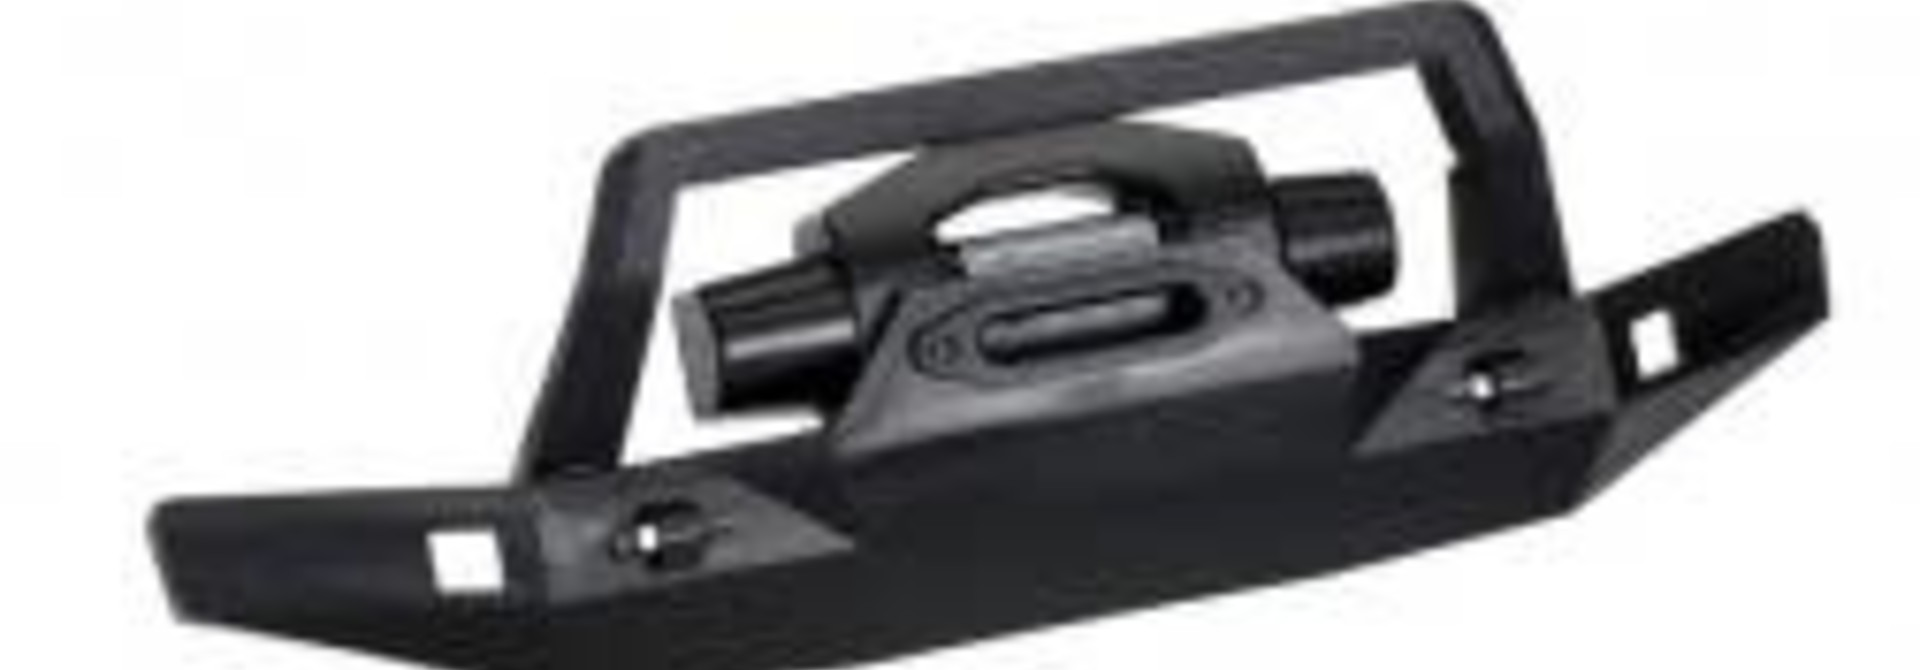 Bumper, front (178mm wide)/ winch/ 2.6x8 BCS (1)